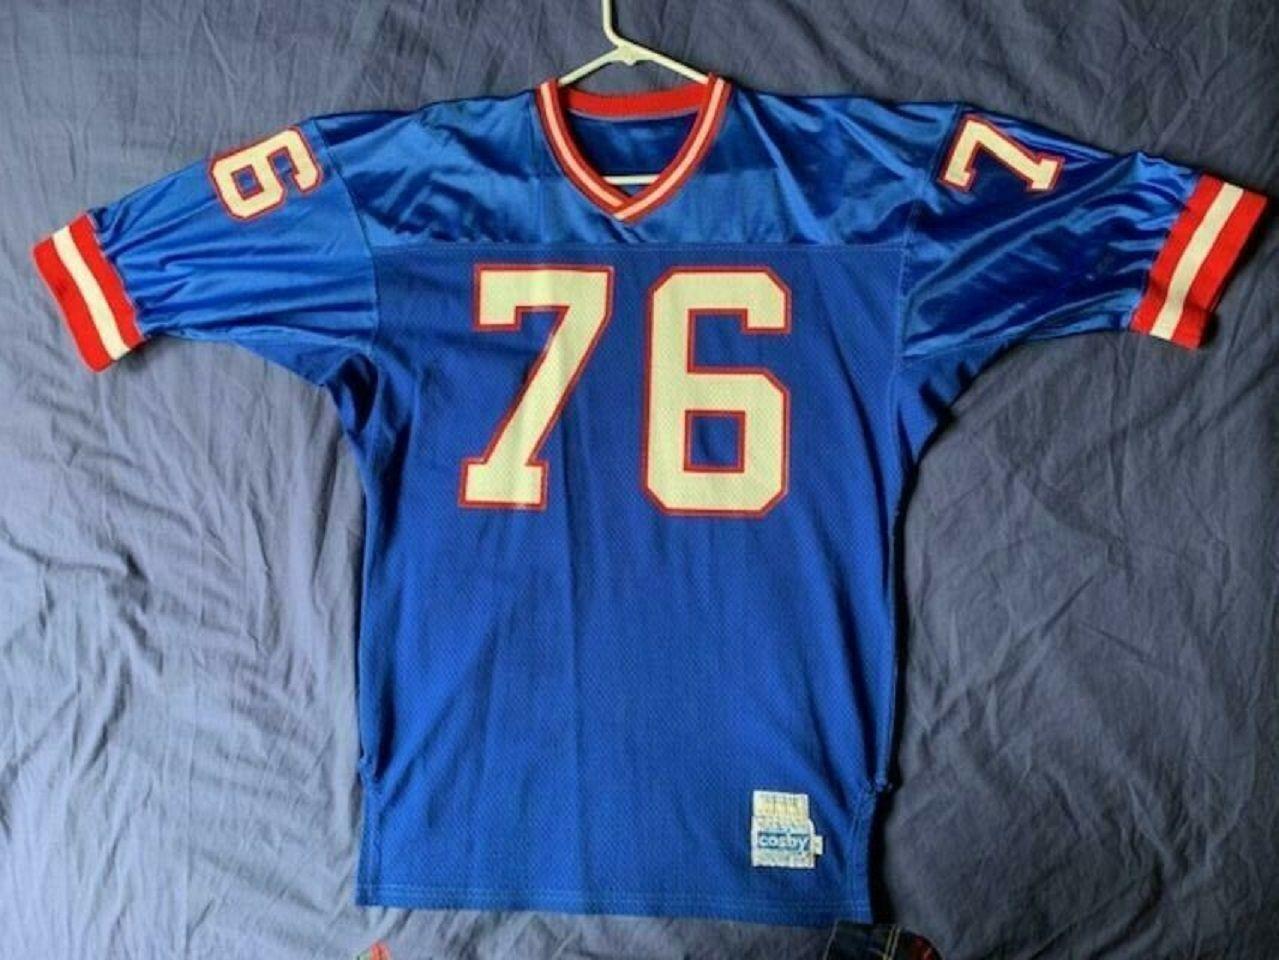 Men S Vintage 80 S Gerry Cosby Nfl New York Giants Jersey 76 Size Xl New York Giants Jersey Nfl New York Giants New York Giants Logo